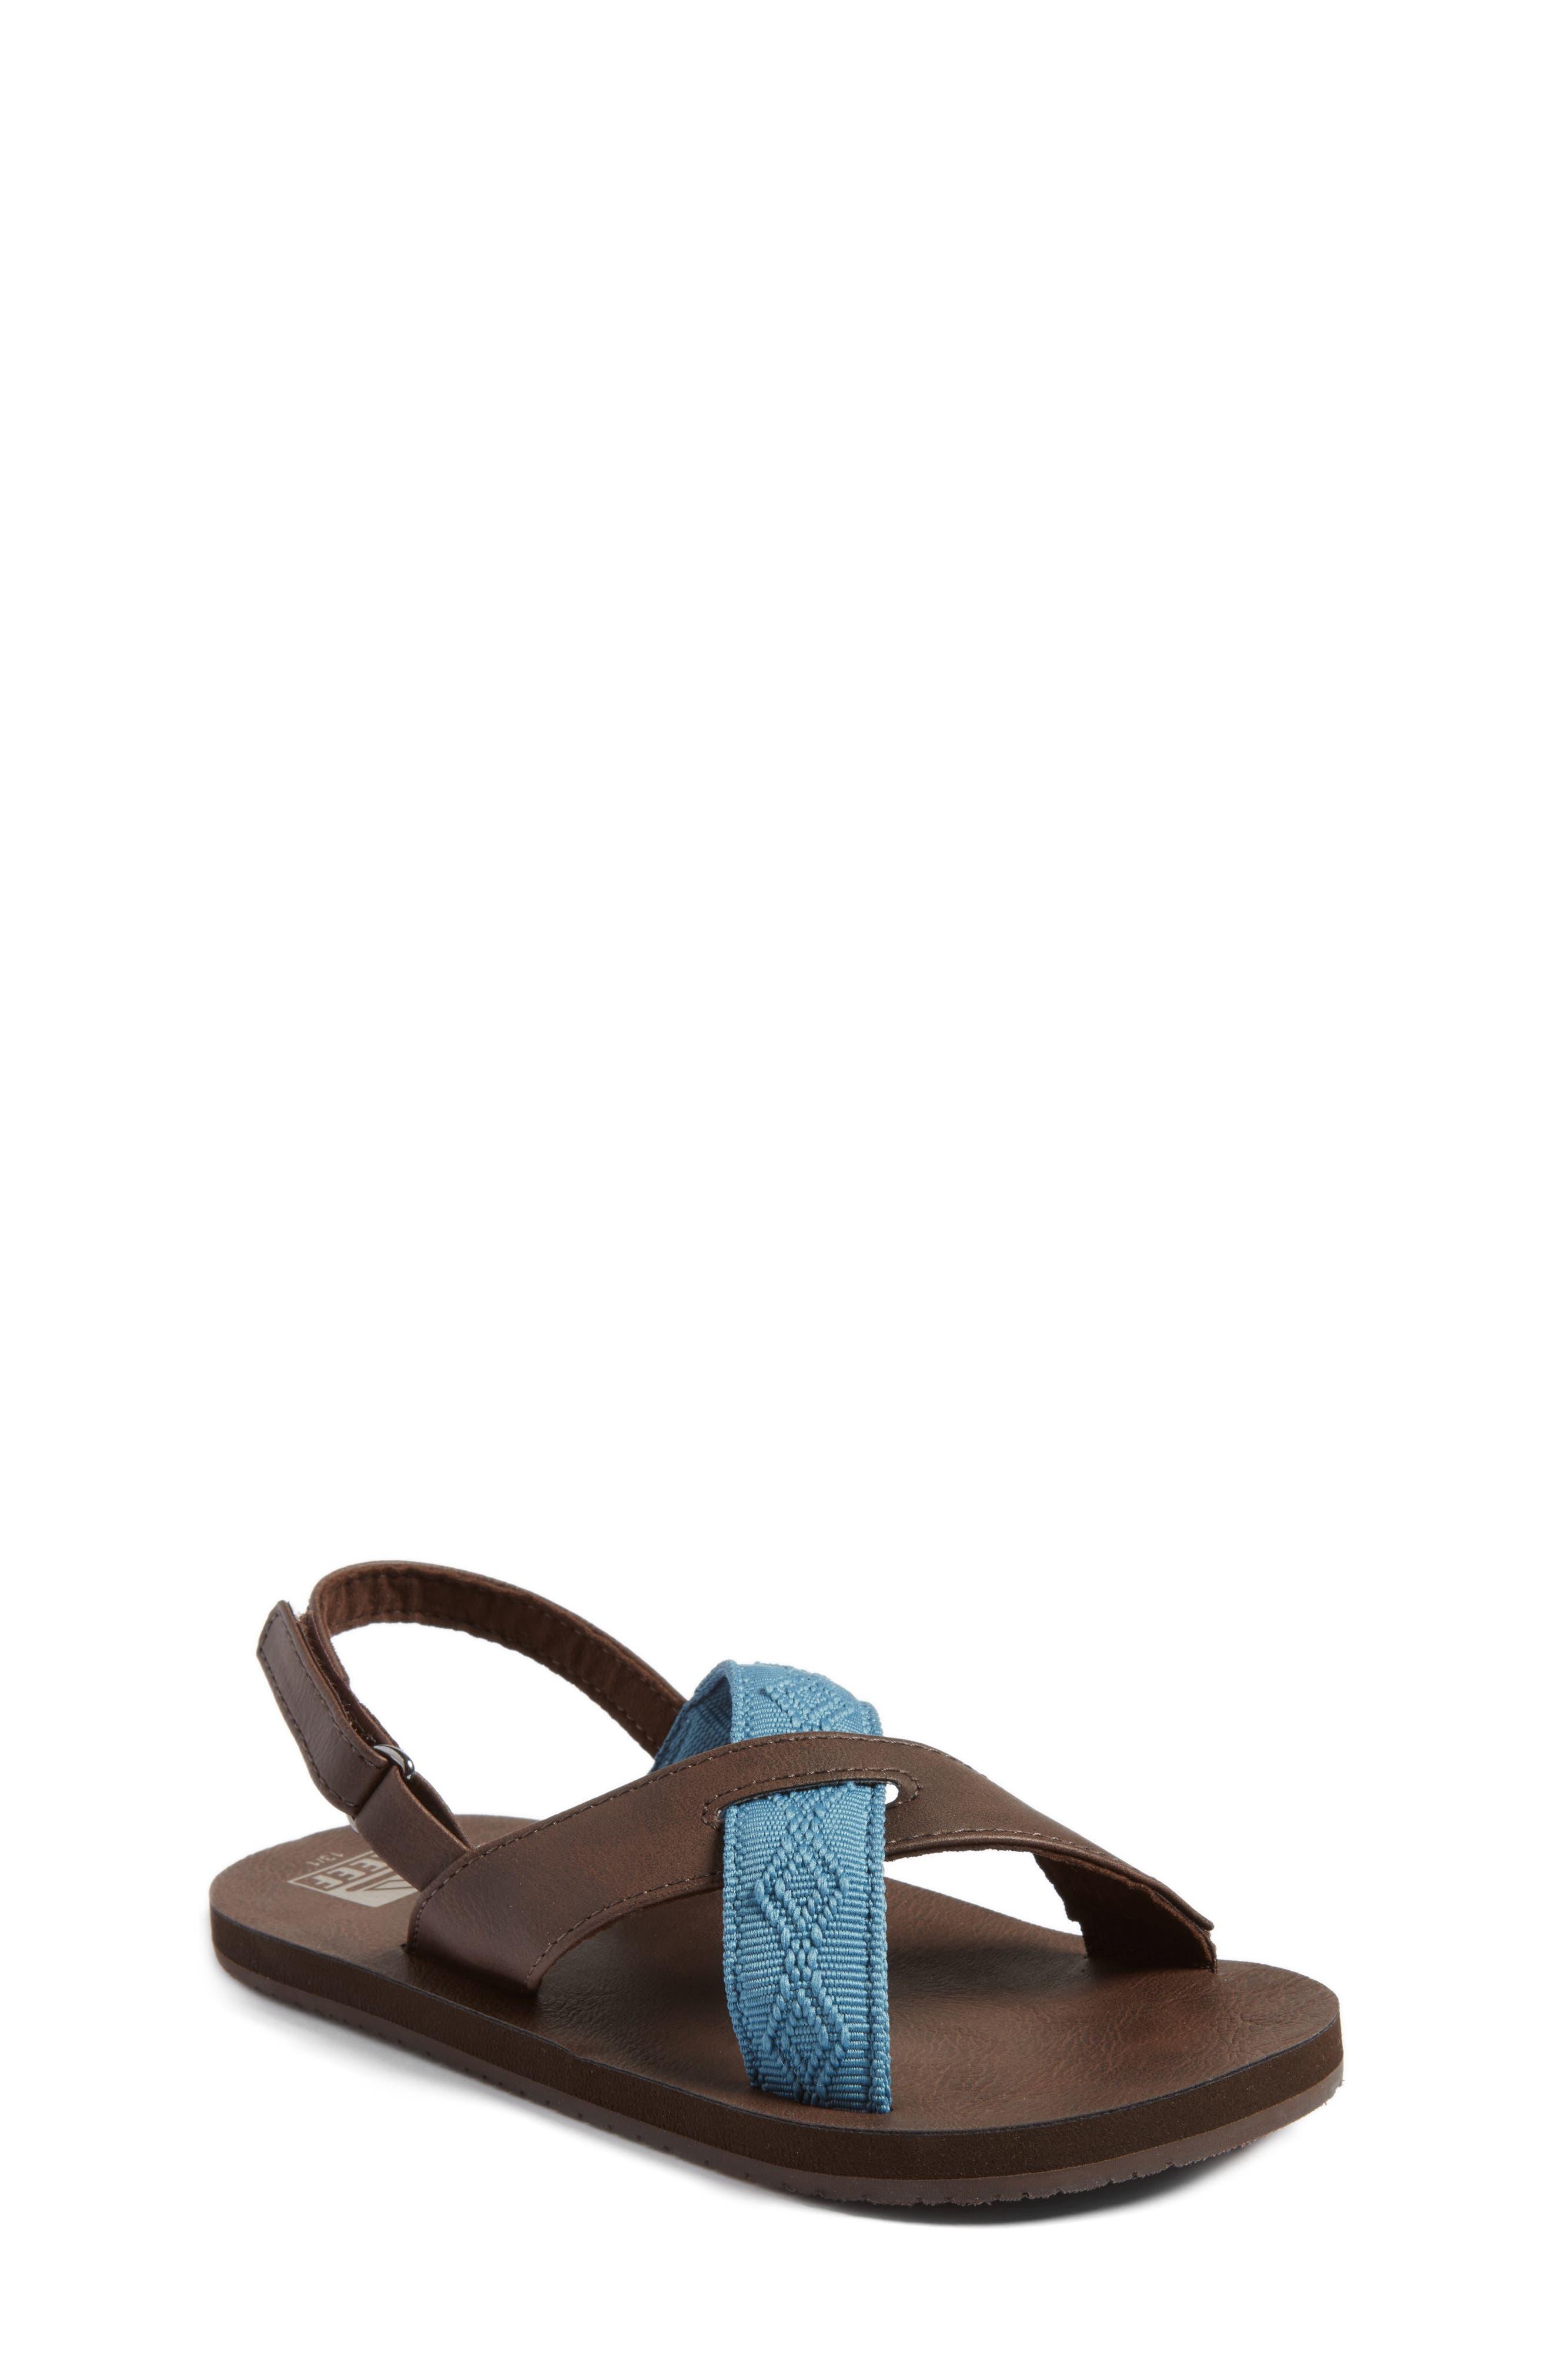 REEF Grom Crossover Sandal